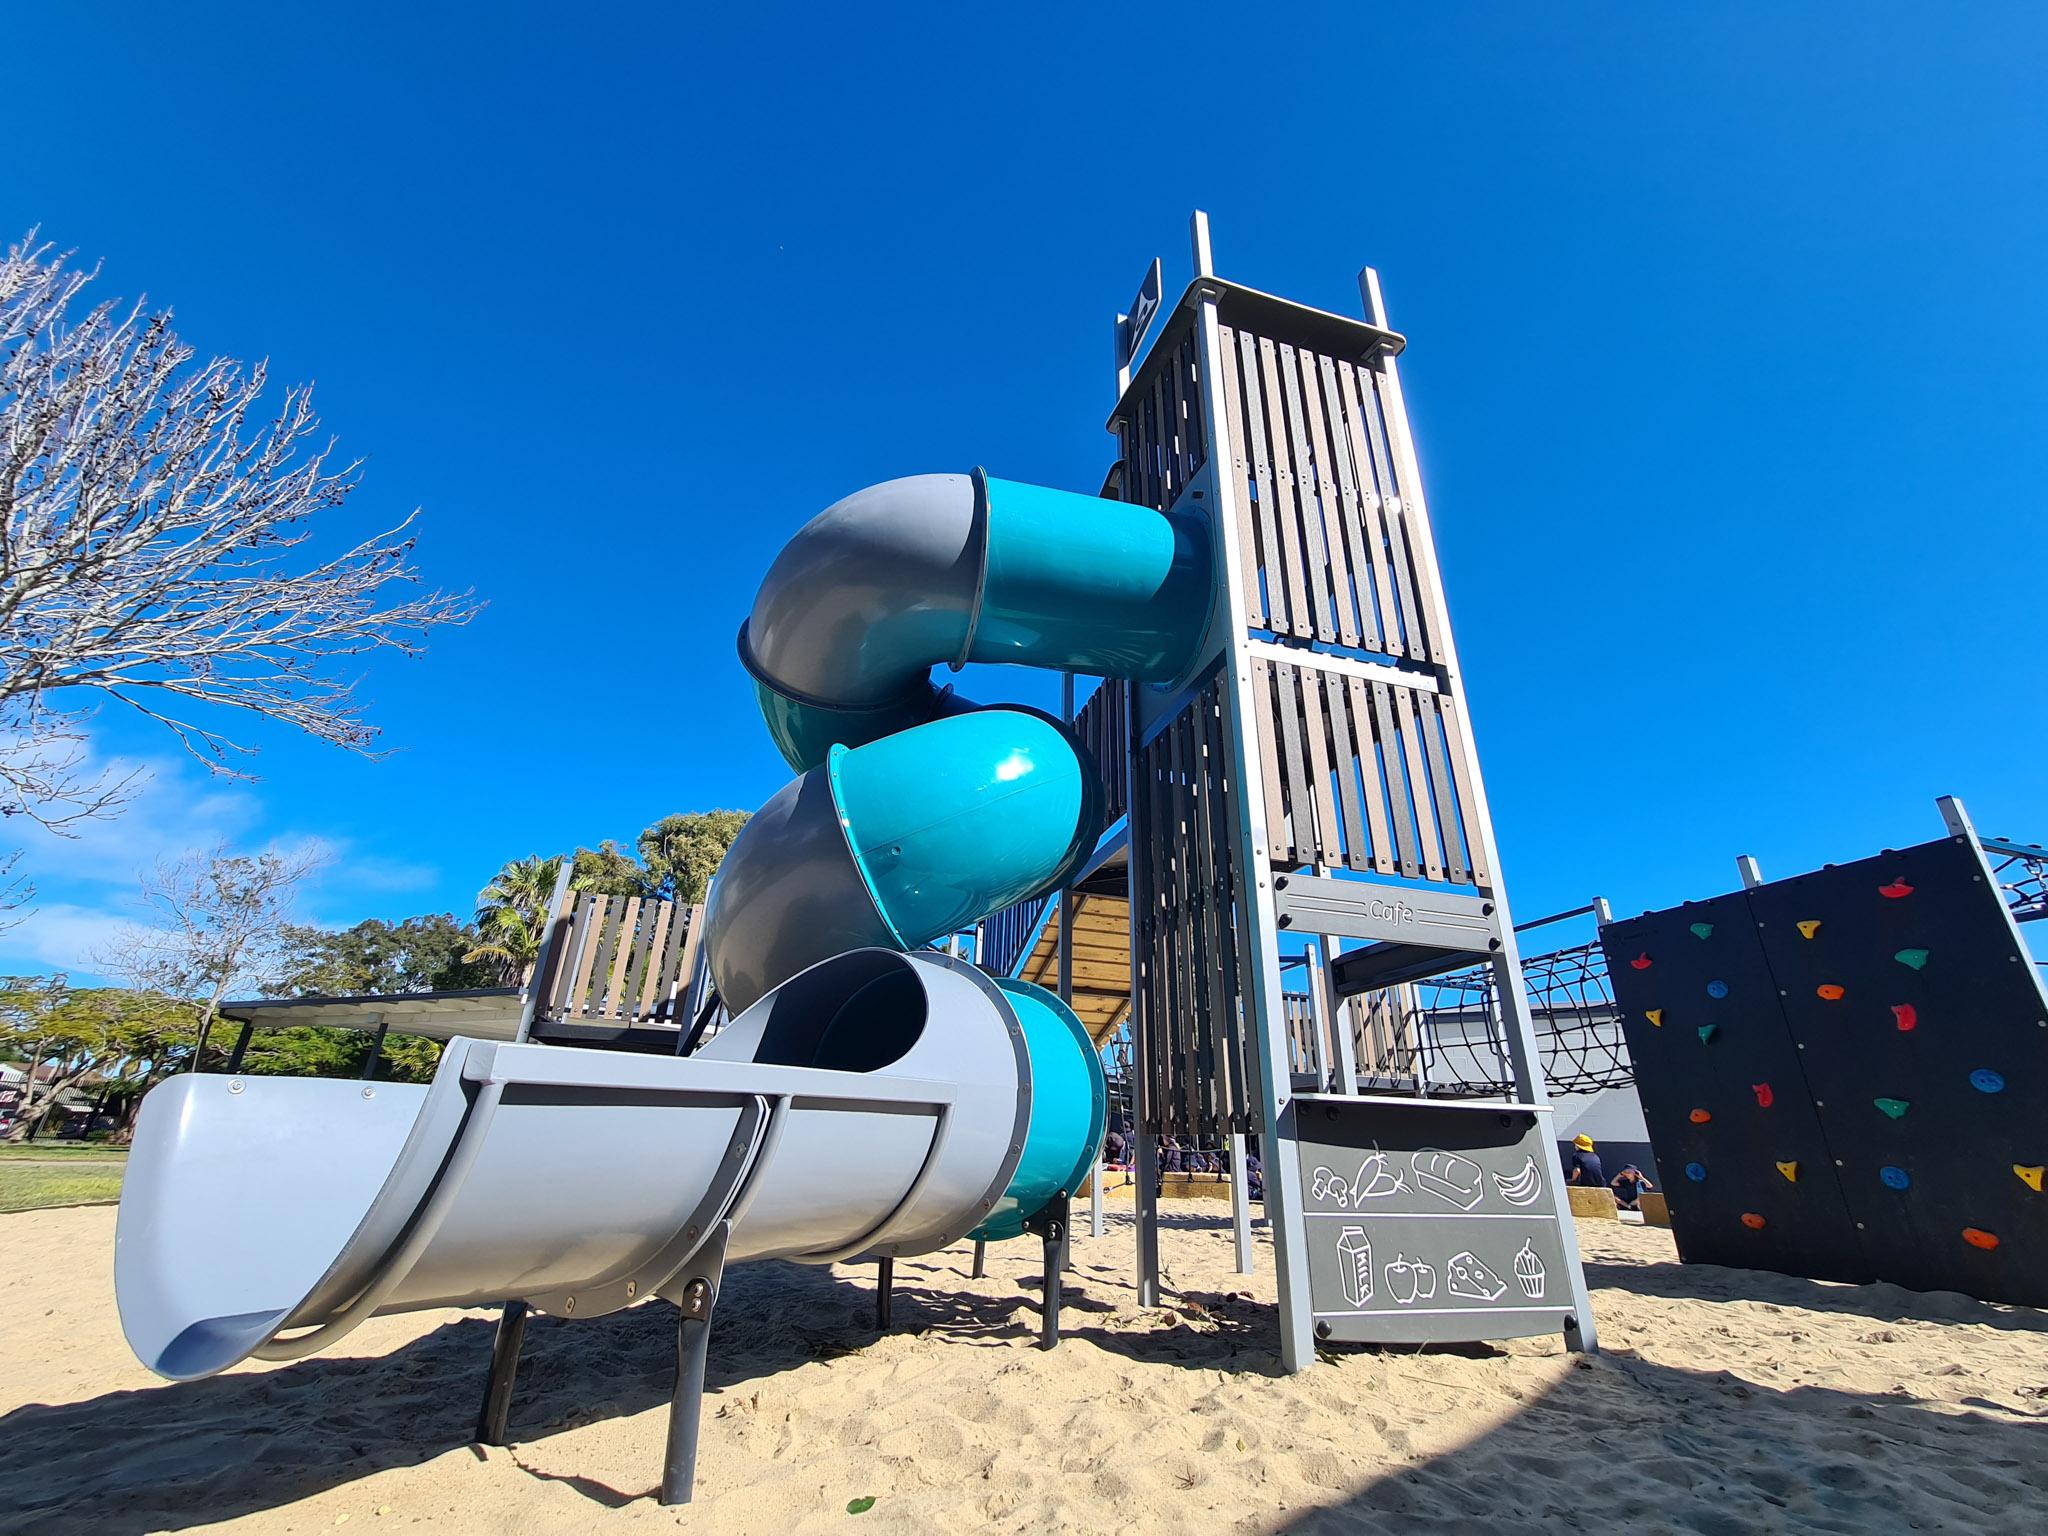 palm-beach-state-school-playrground-austek-play-17